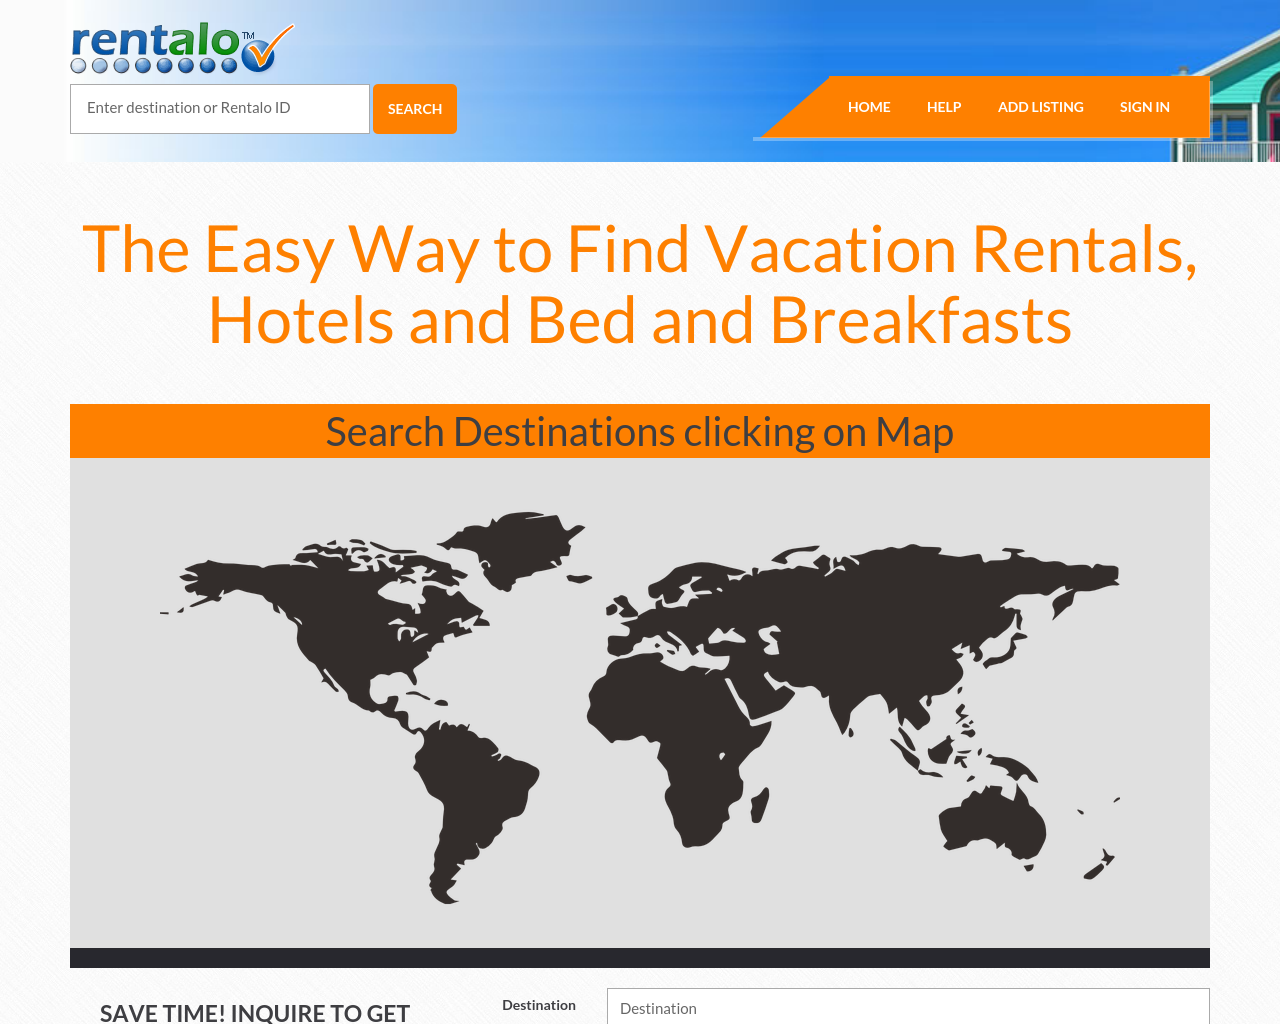 Rentalo-Advertising-Reviews-Pricing